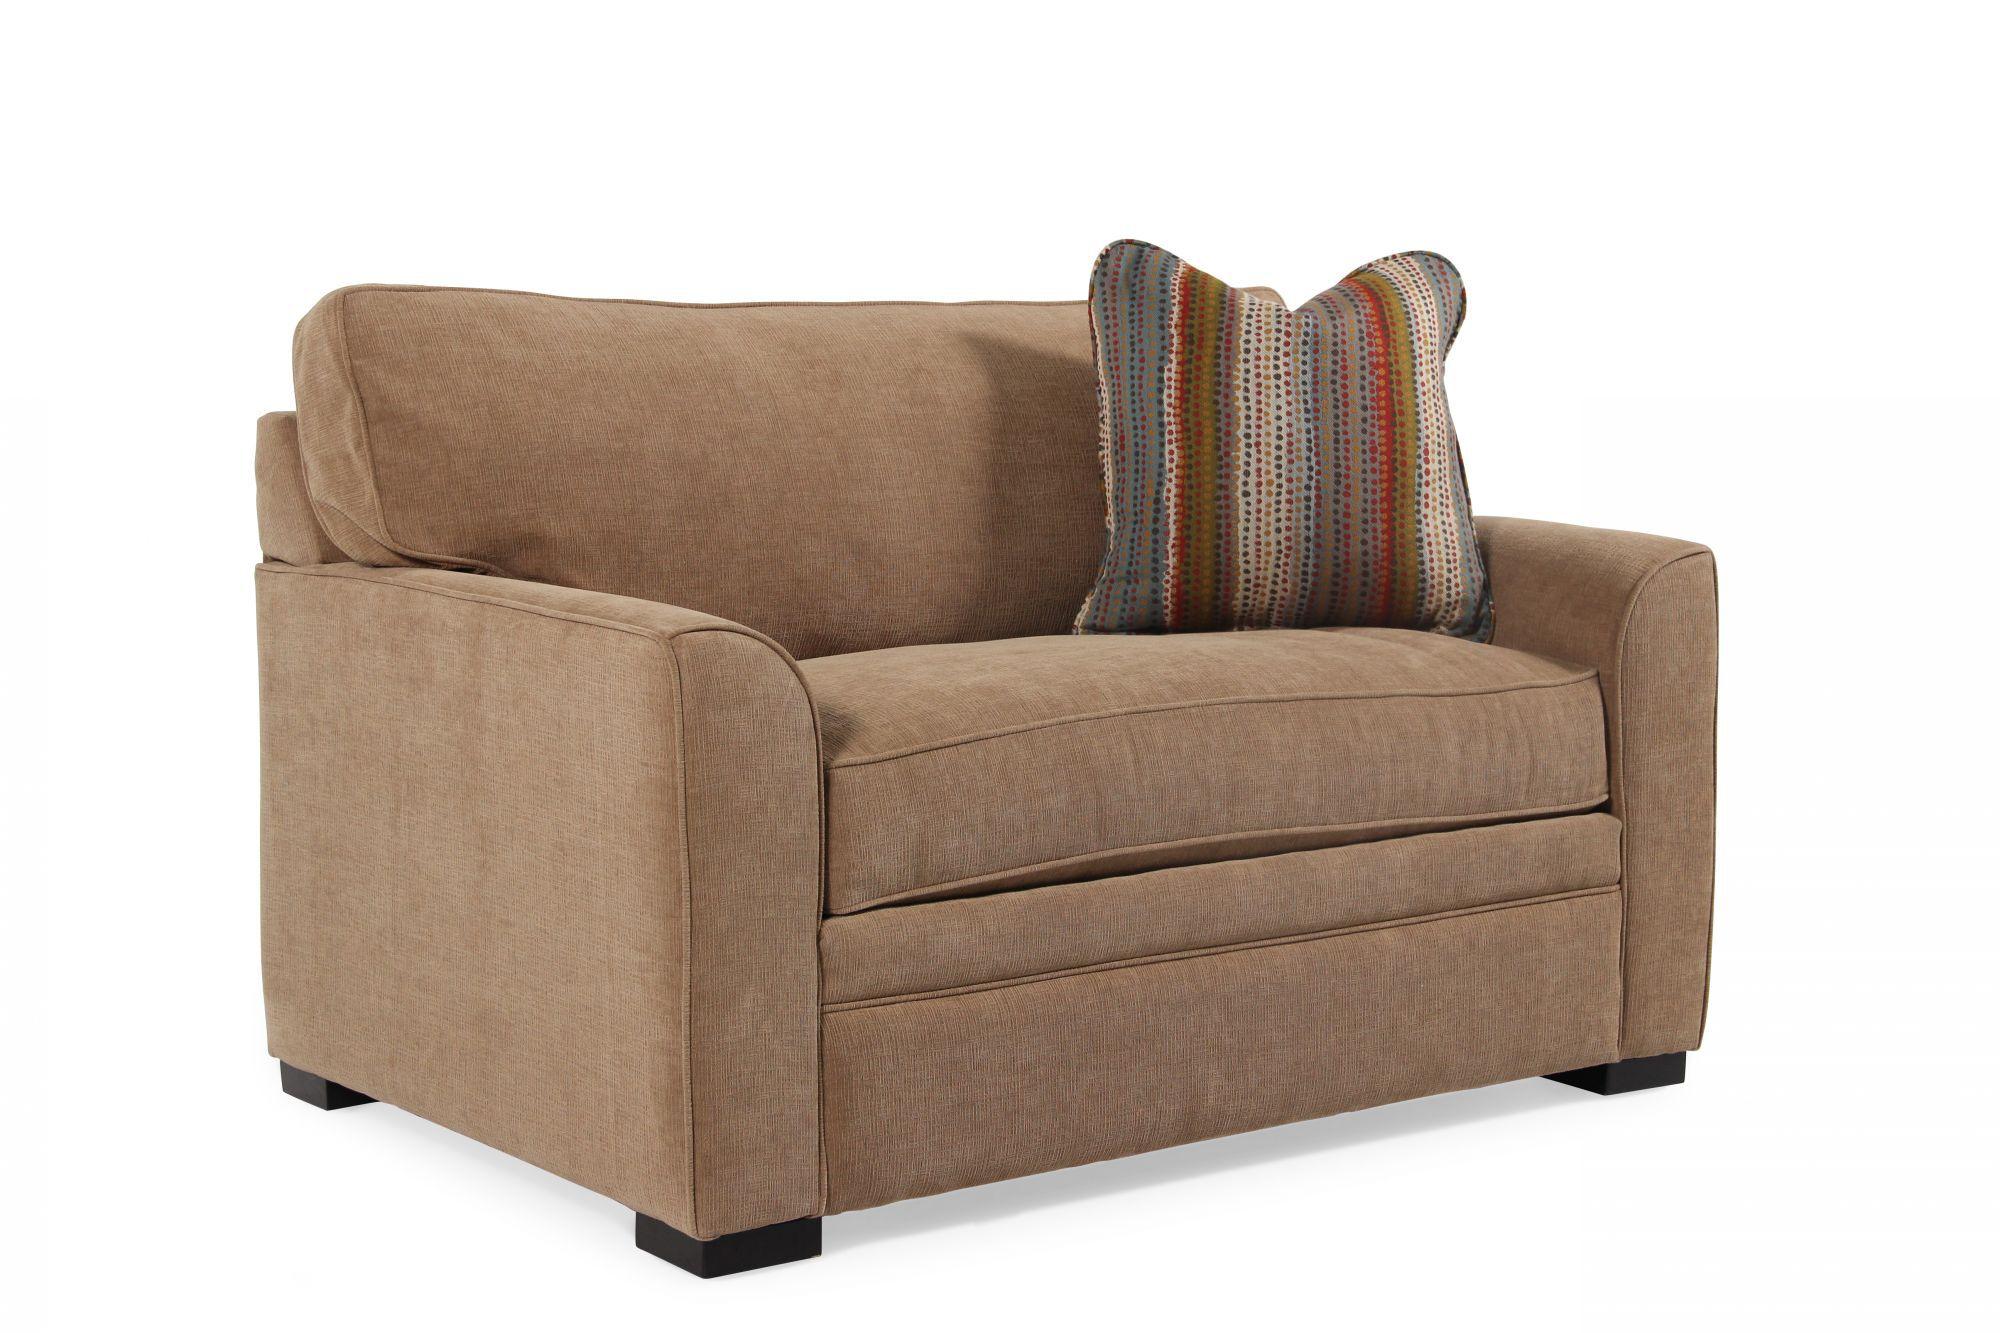 sh memory foam sleeper sofa mattress eq3 bed review jonathan louis blissful brown chairbed